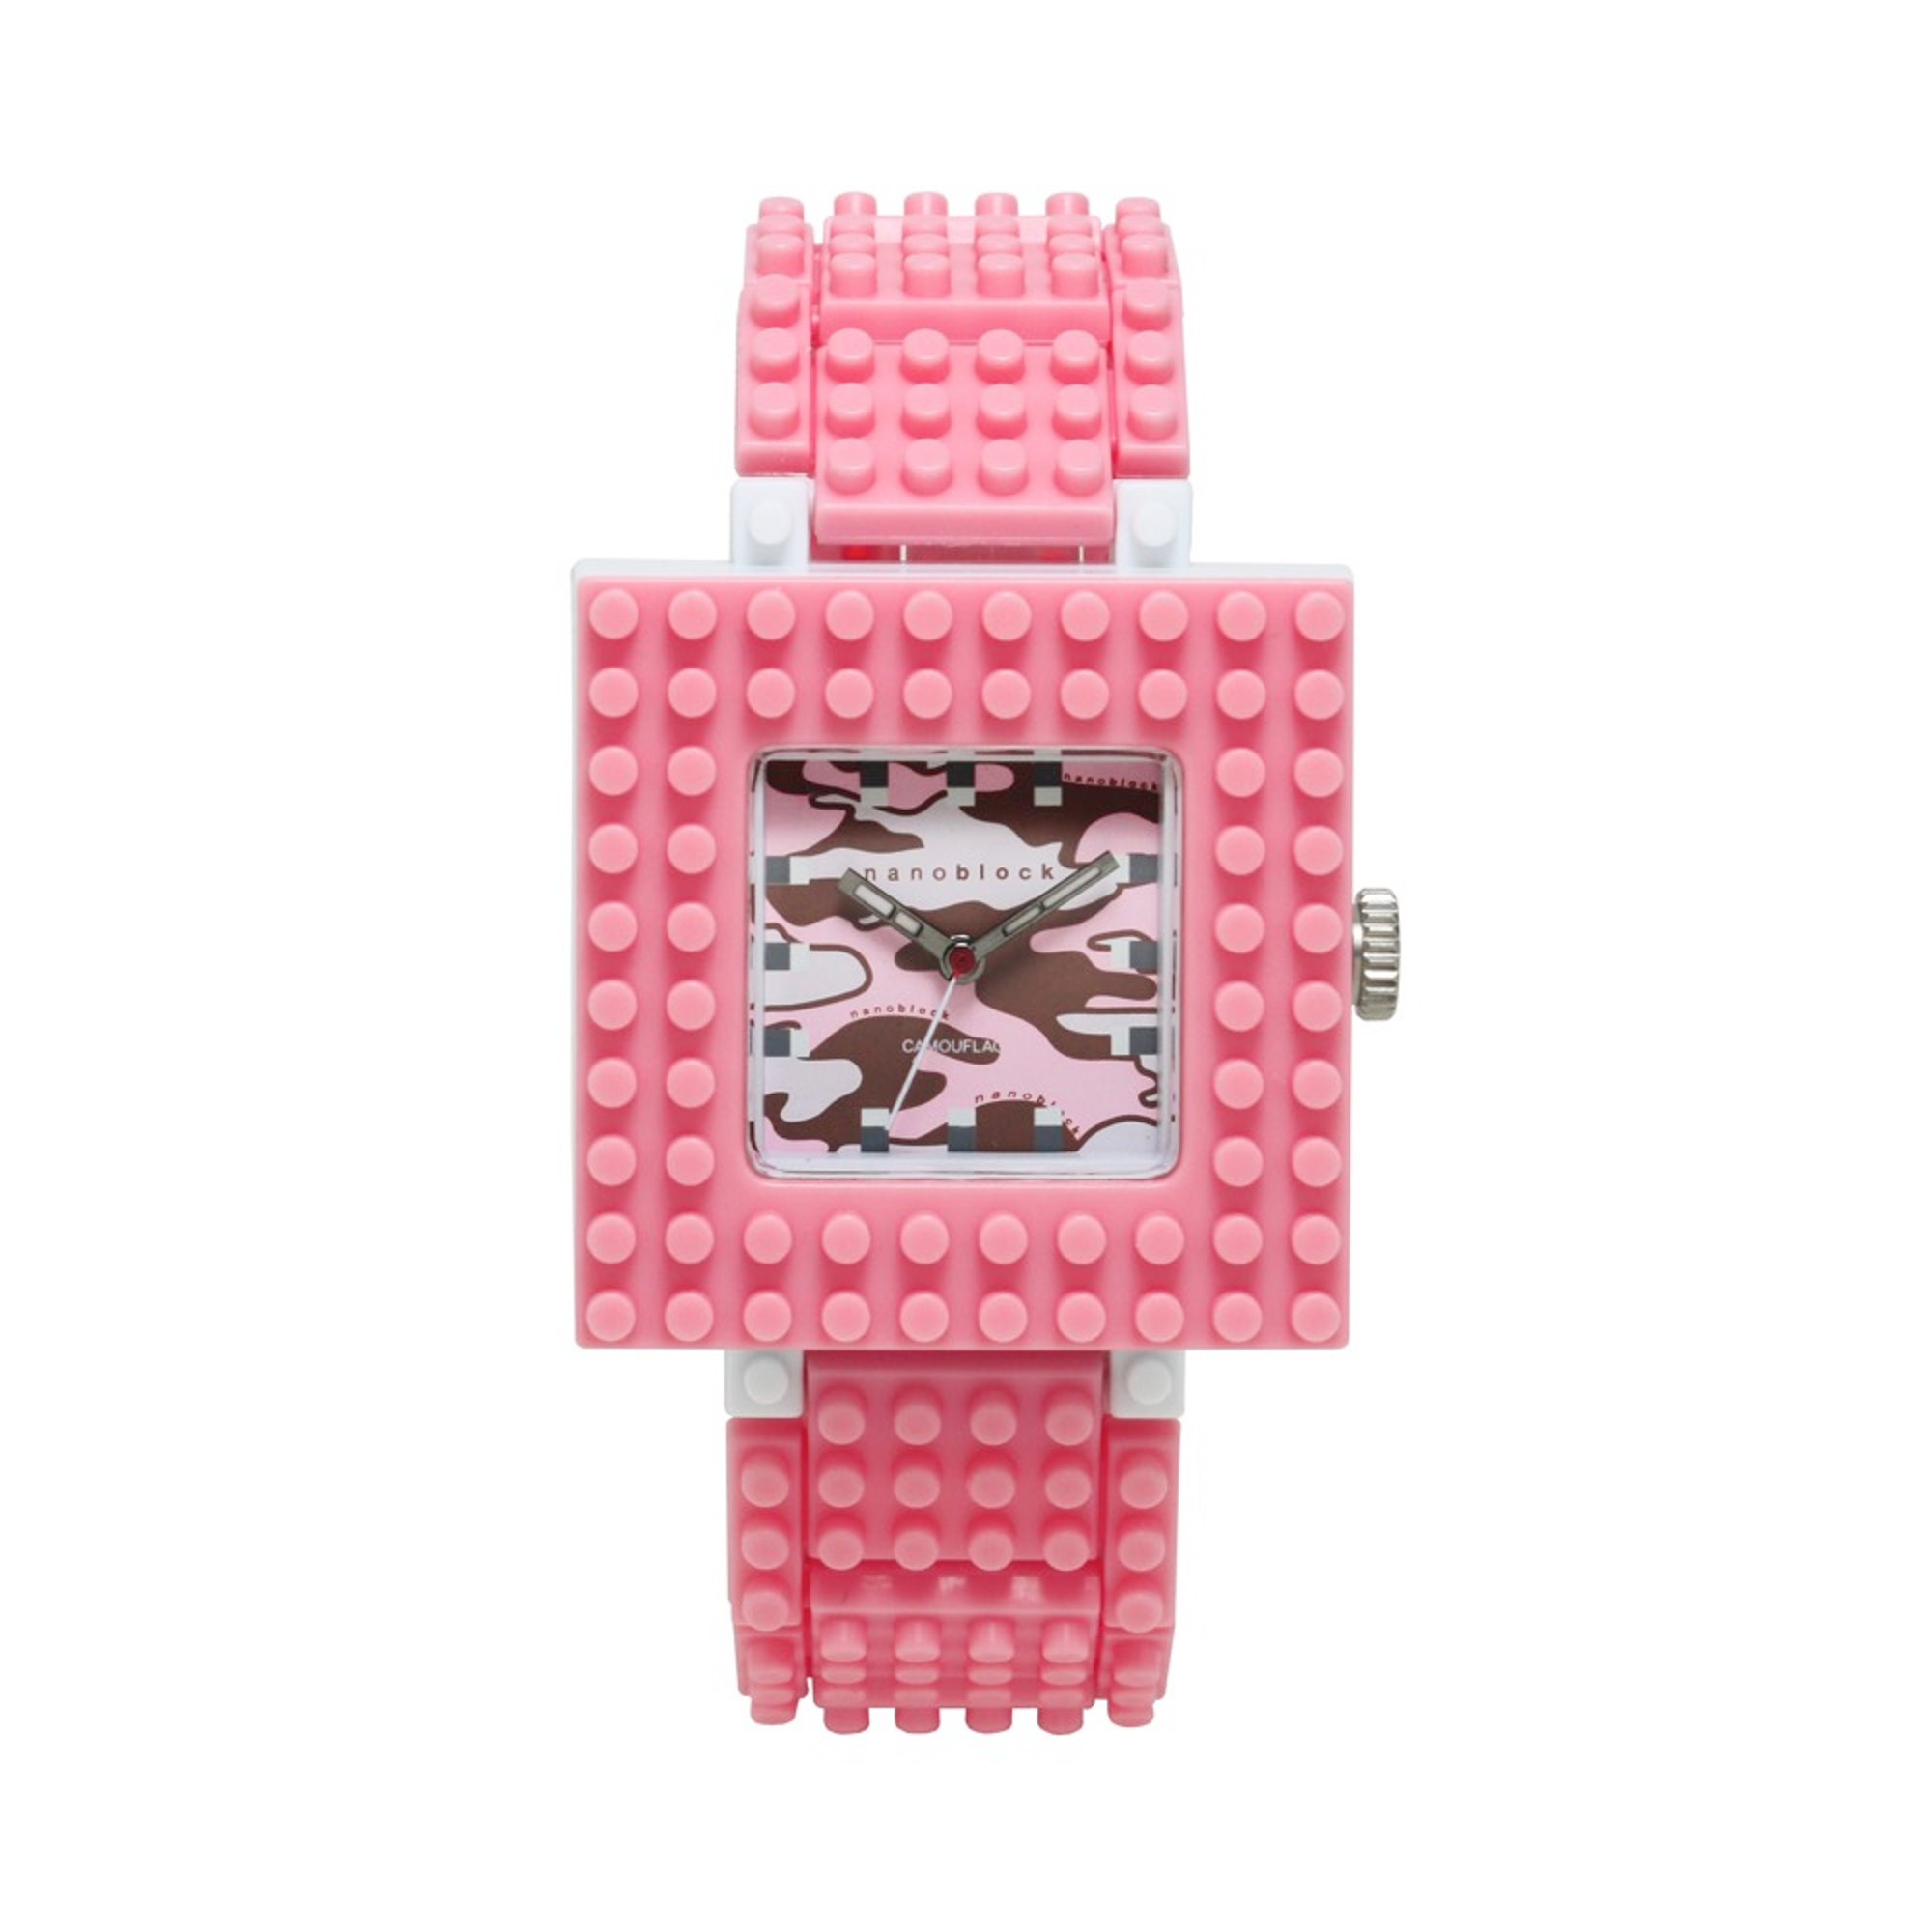 Nanoblocktime Nano Camo Squared Watch, Pink Camo by Nanoblocktime